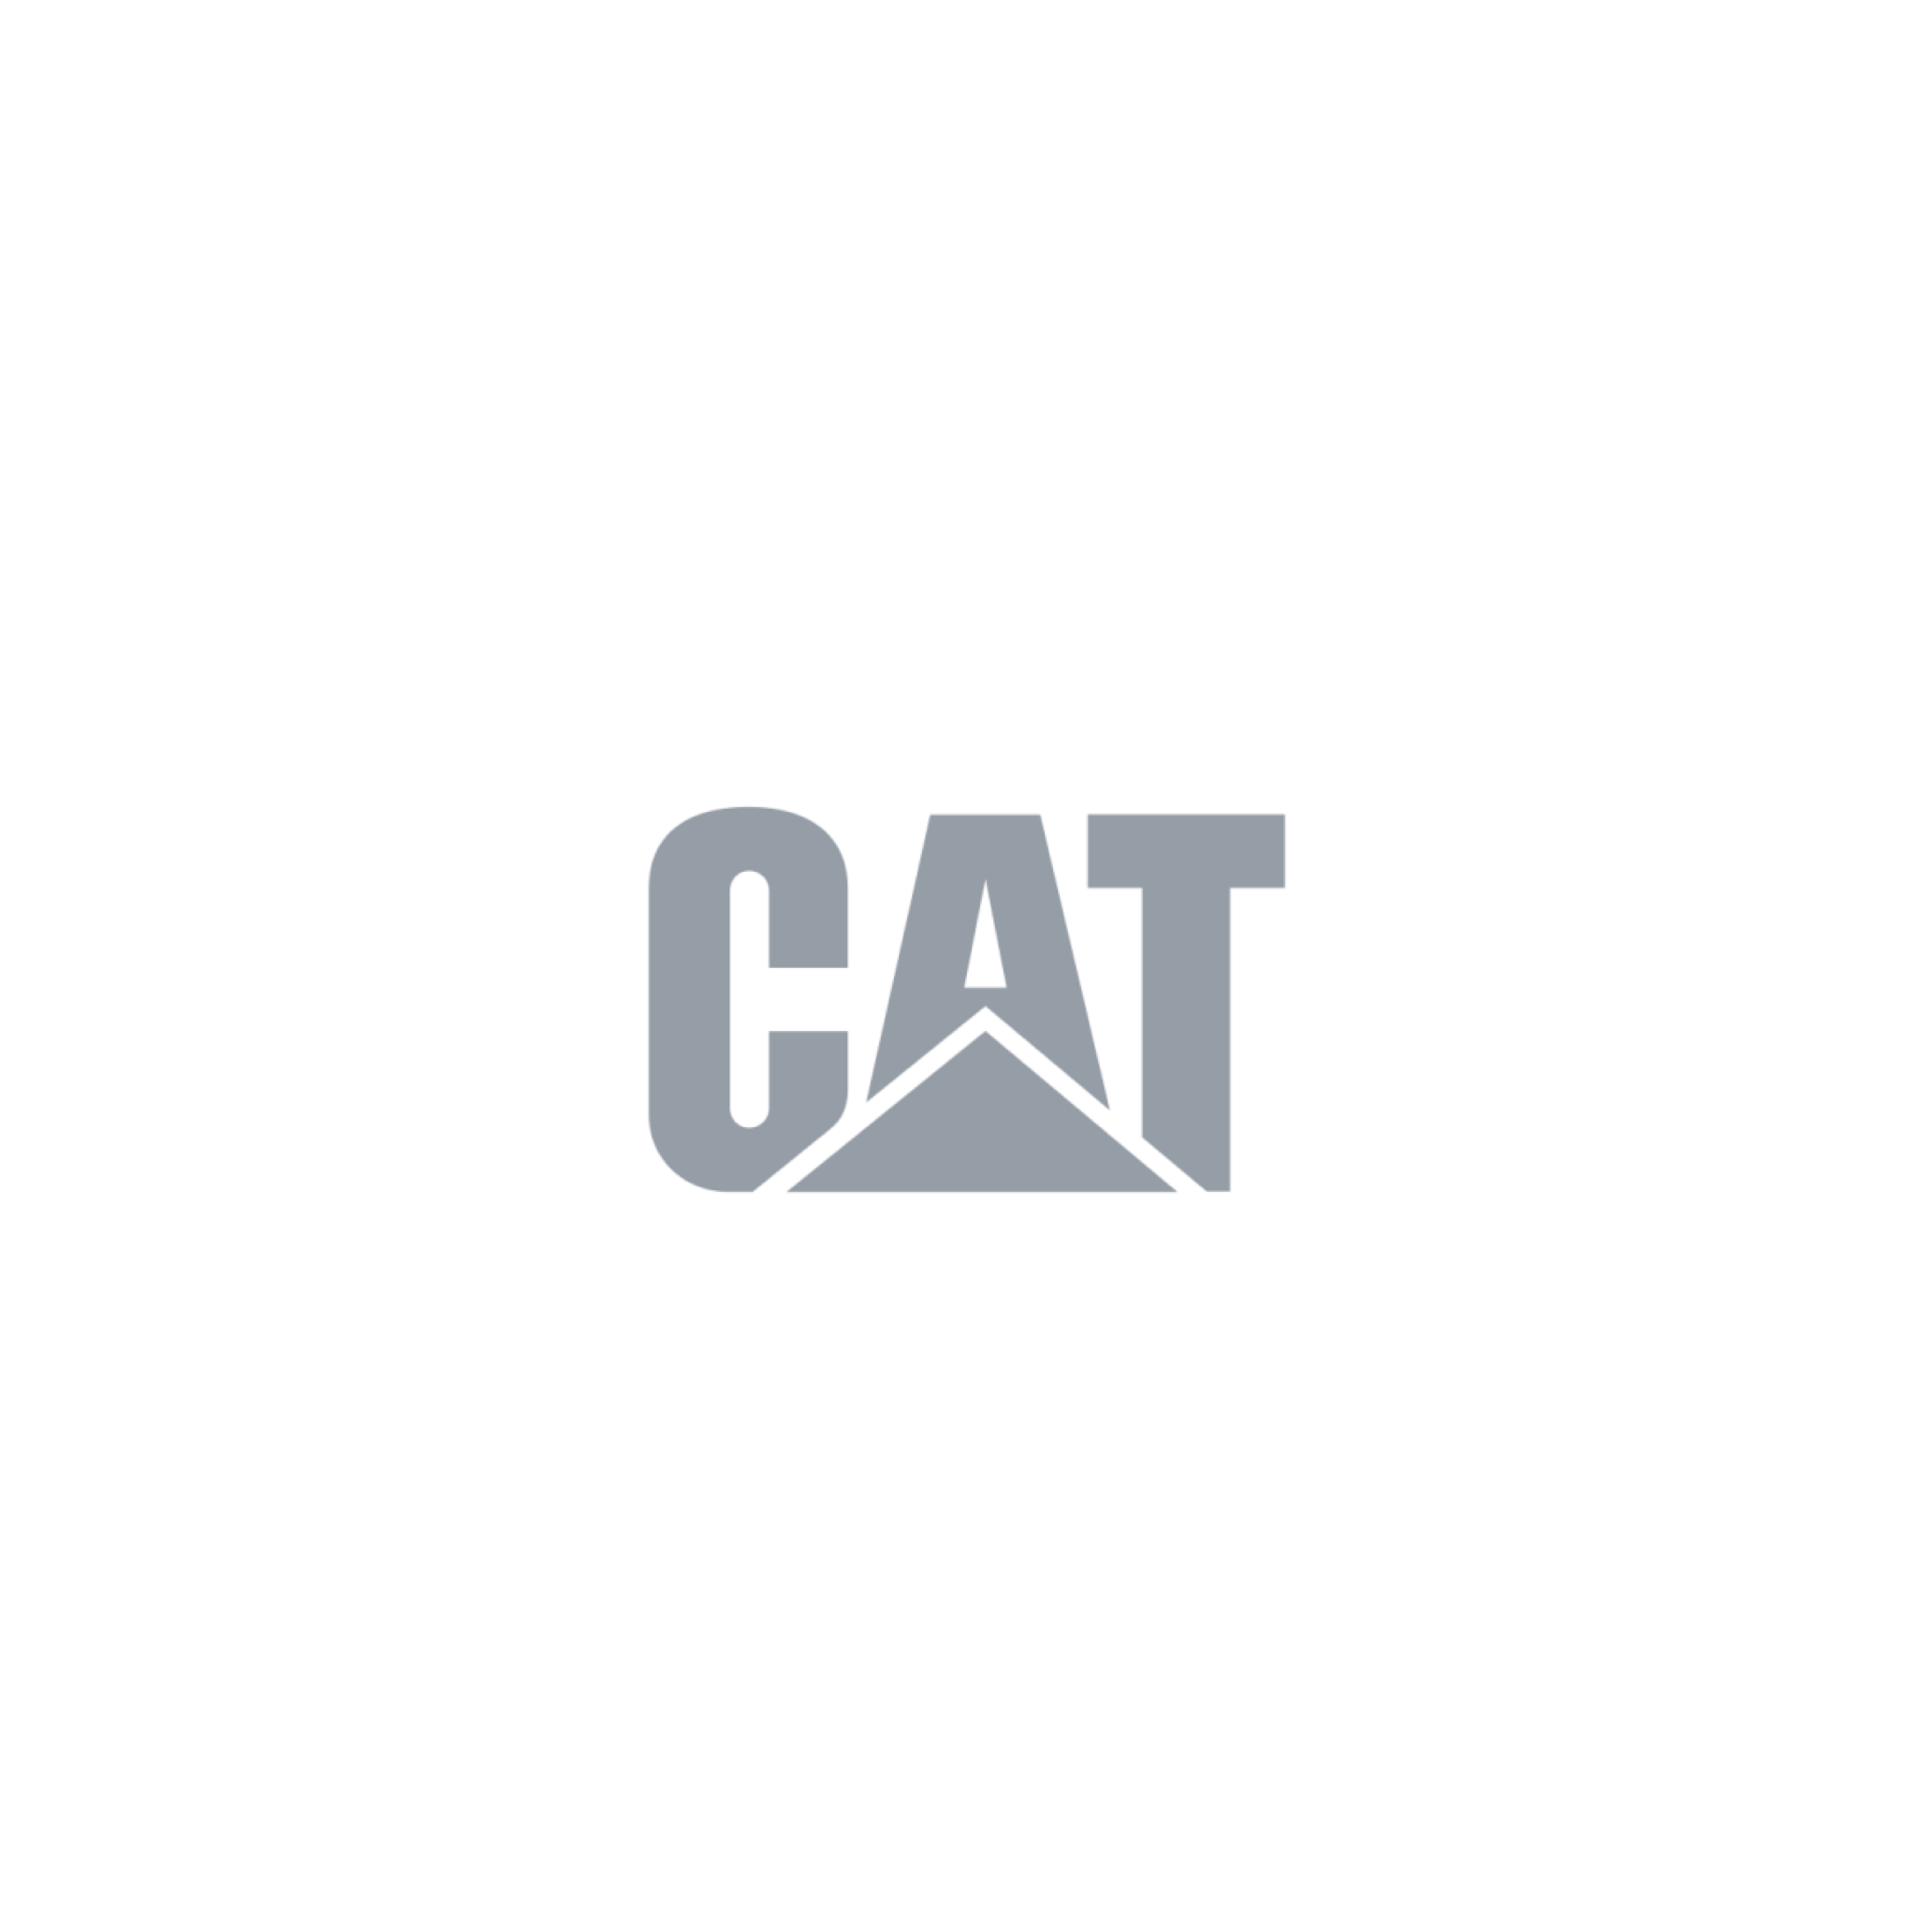 CAT Alejandro Mejias.png